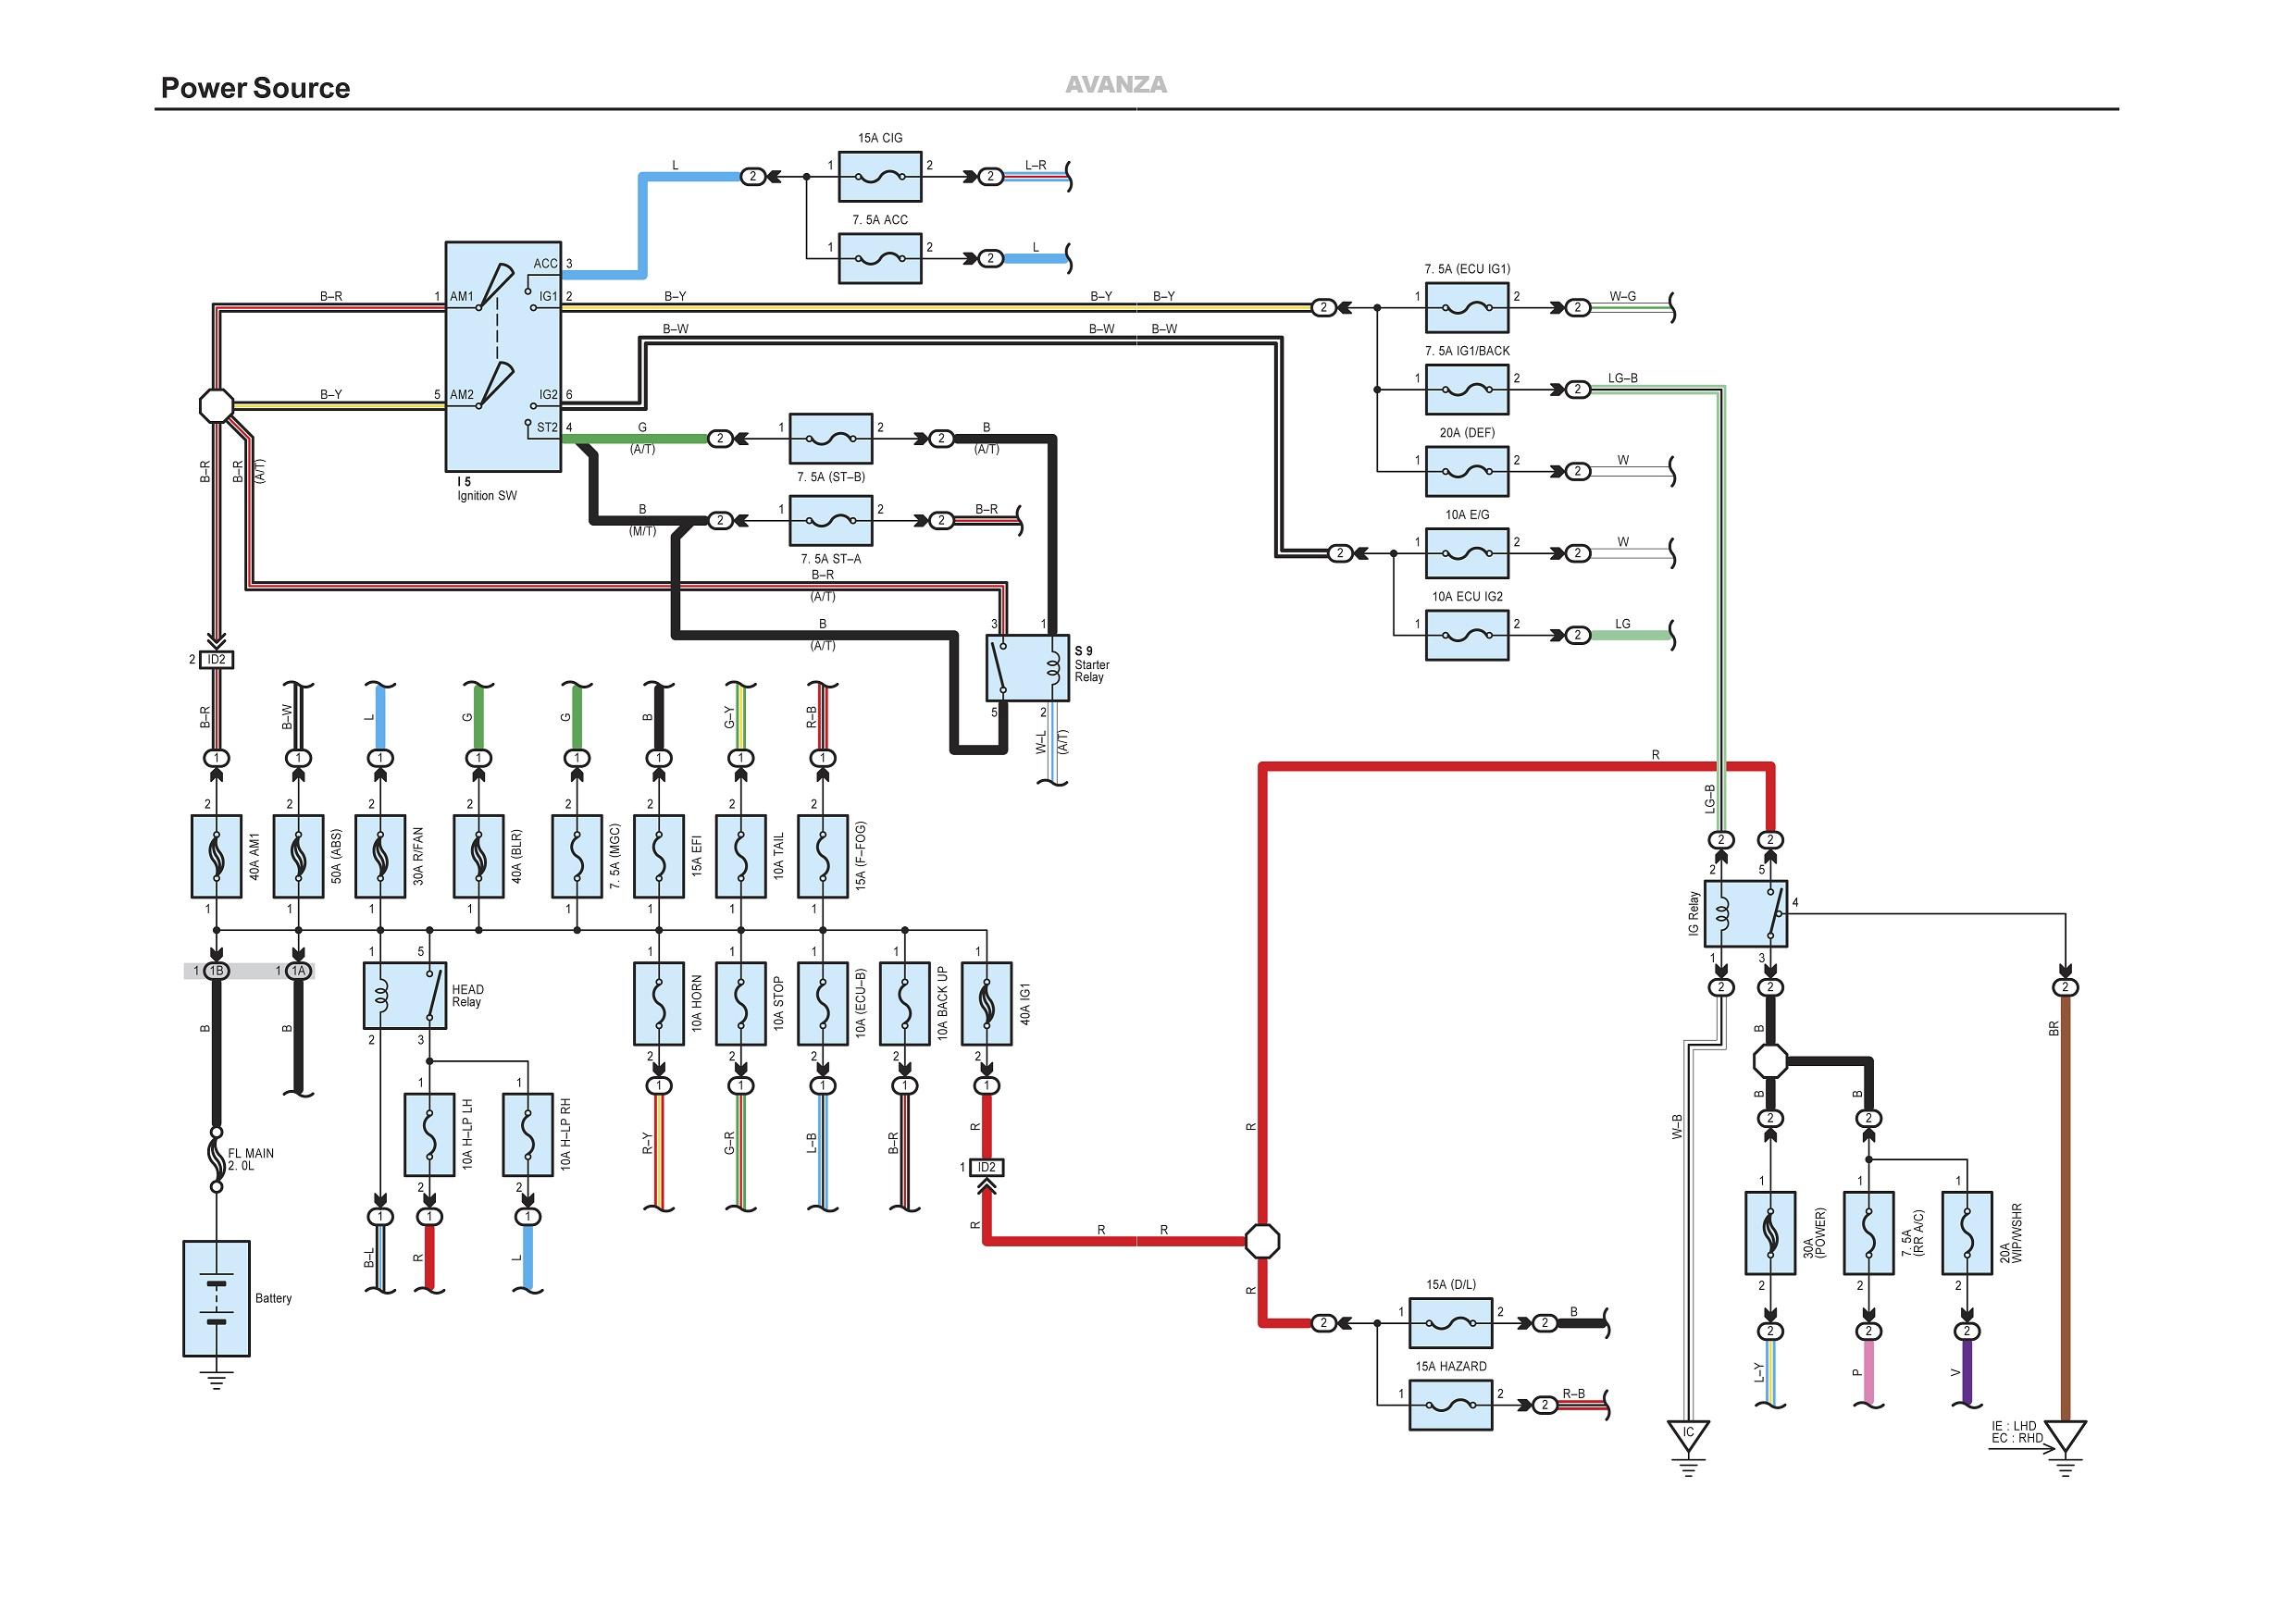 Kumpulan gambar wiring diagram sepeda motor terlengkap dinding motor materi ajar guru otomotif asfbconference2016 Image collections